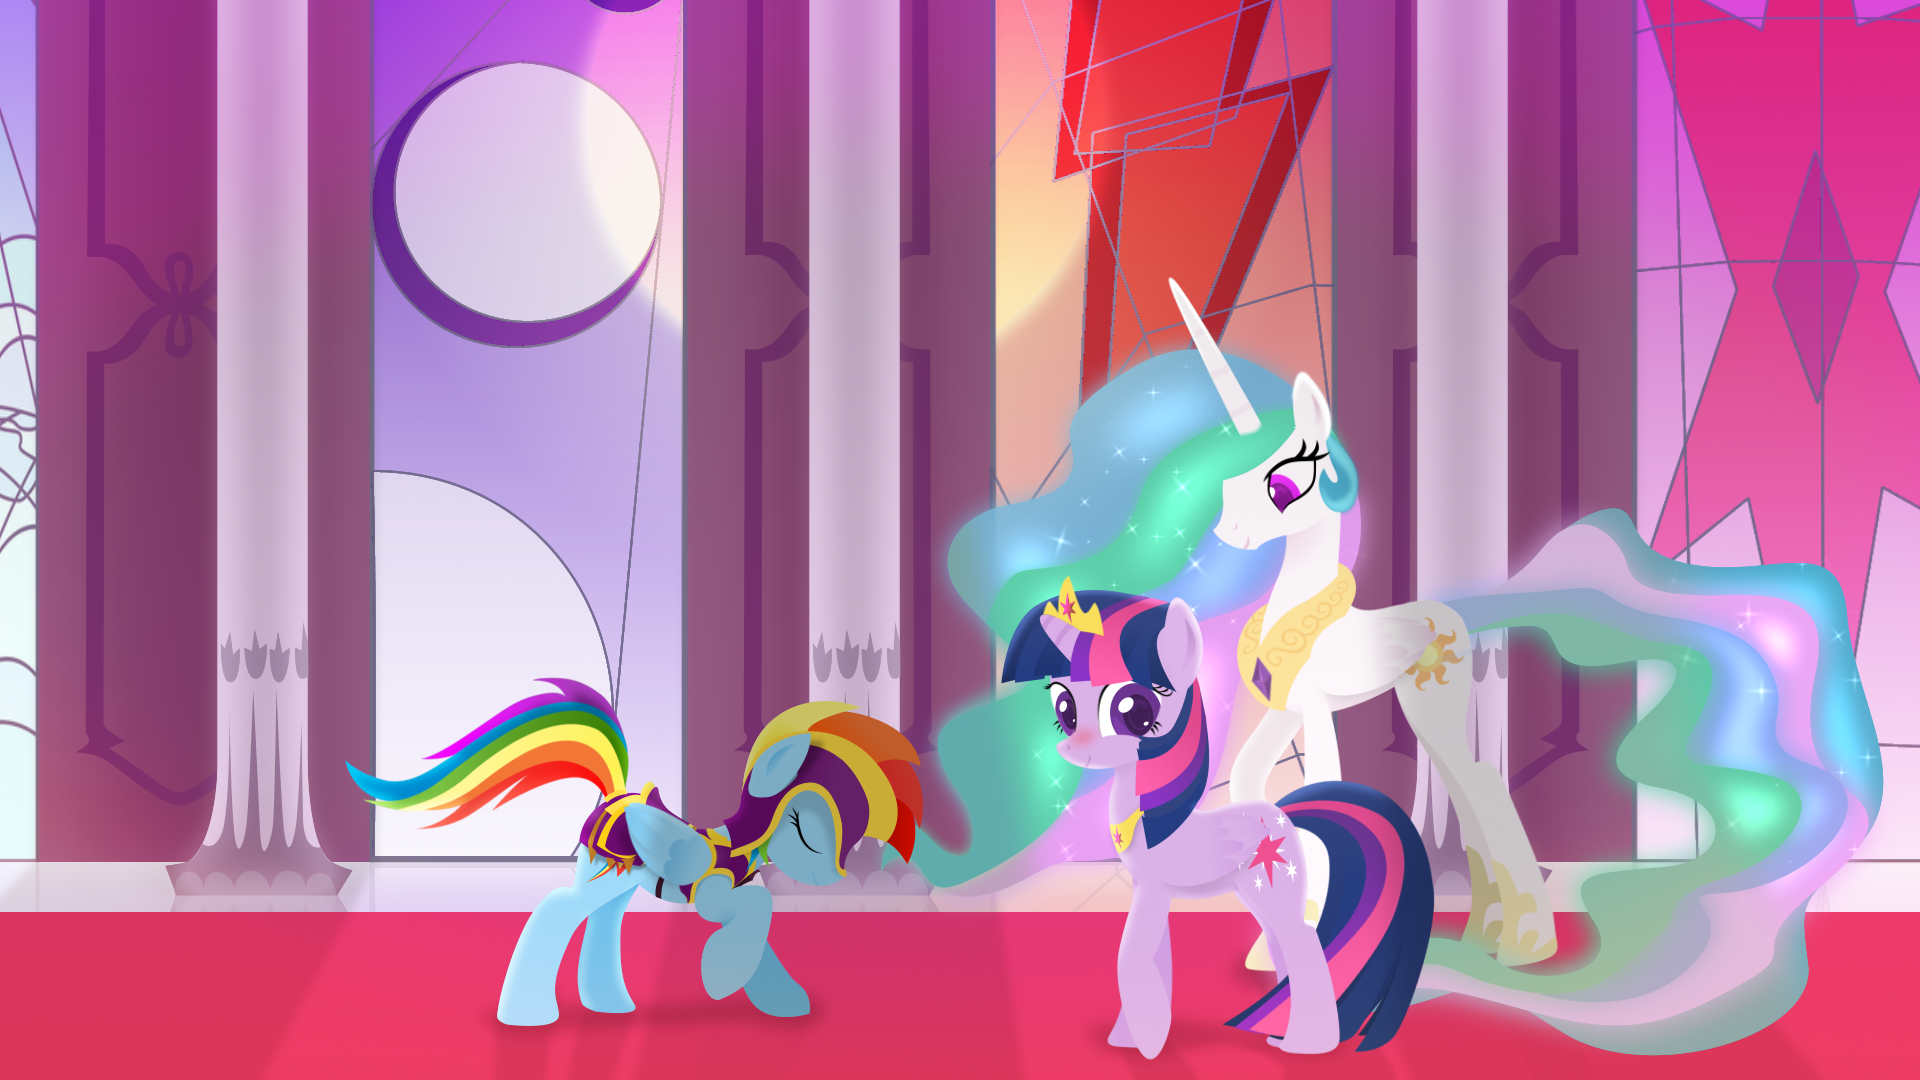 My little pony princess twilight sparkle and flash sentry kiss - photo#2